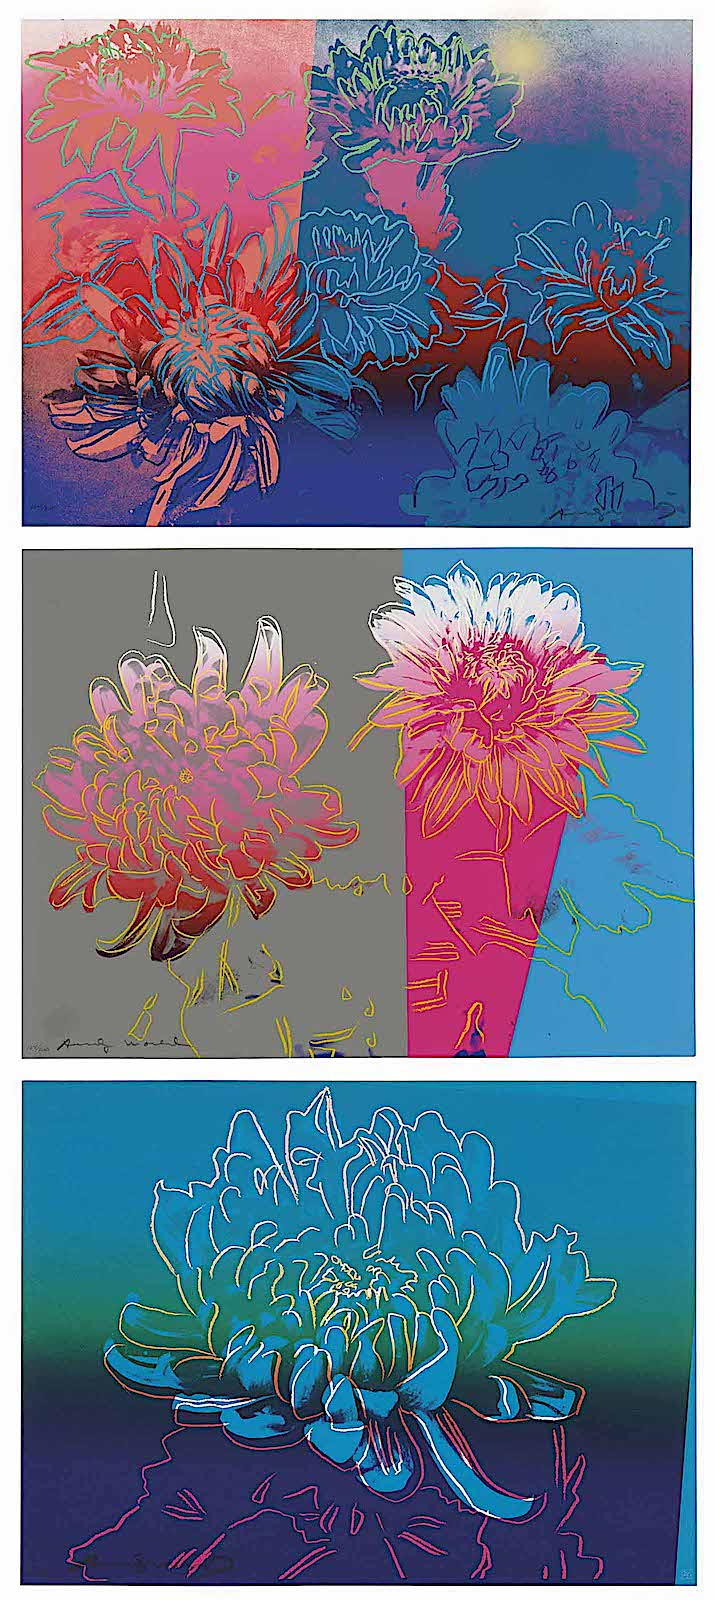 Andy Warhol flowers, a tripdich